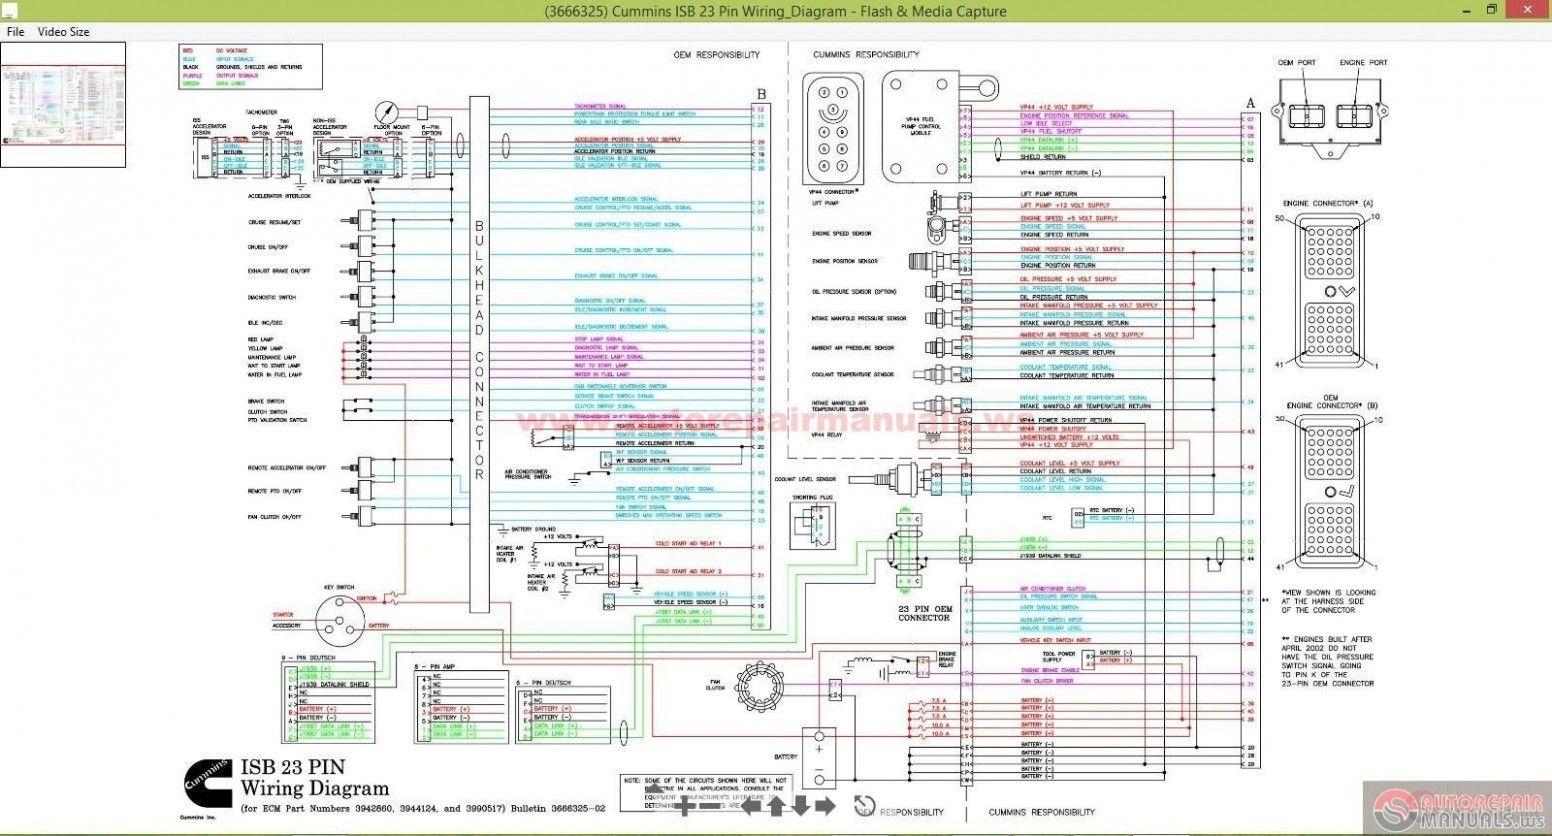 2007 Peterbilt Wiring Diagram